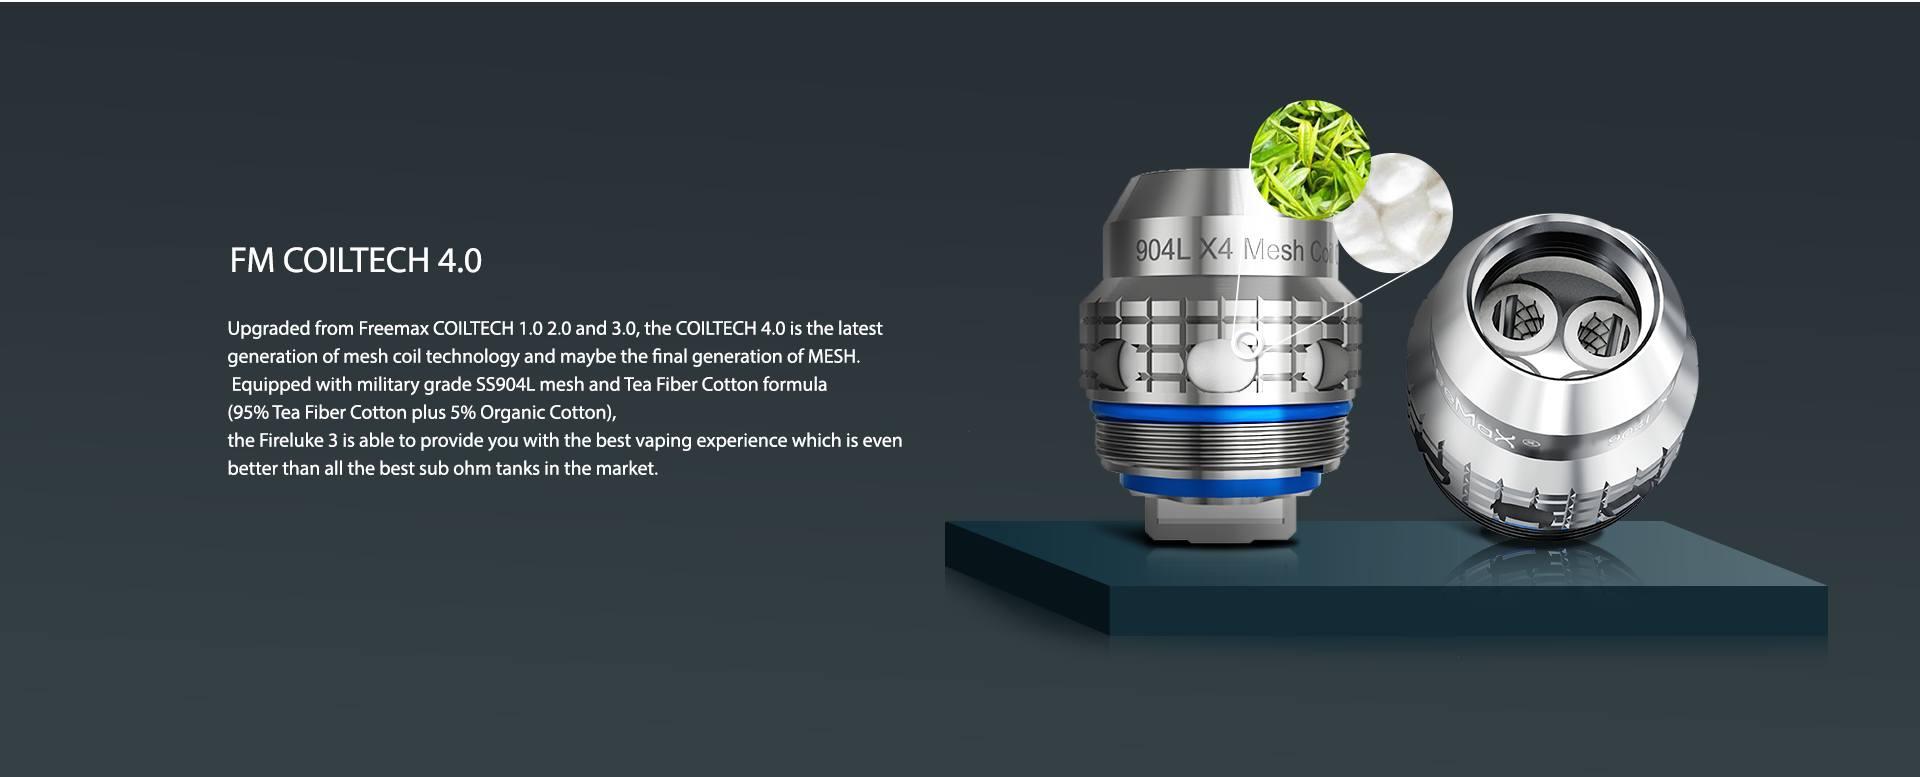 Maxus 100w tea fiber.jpg